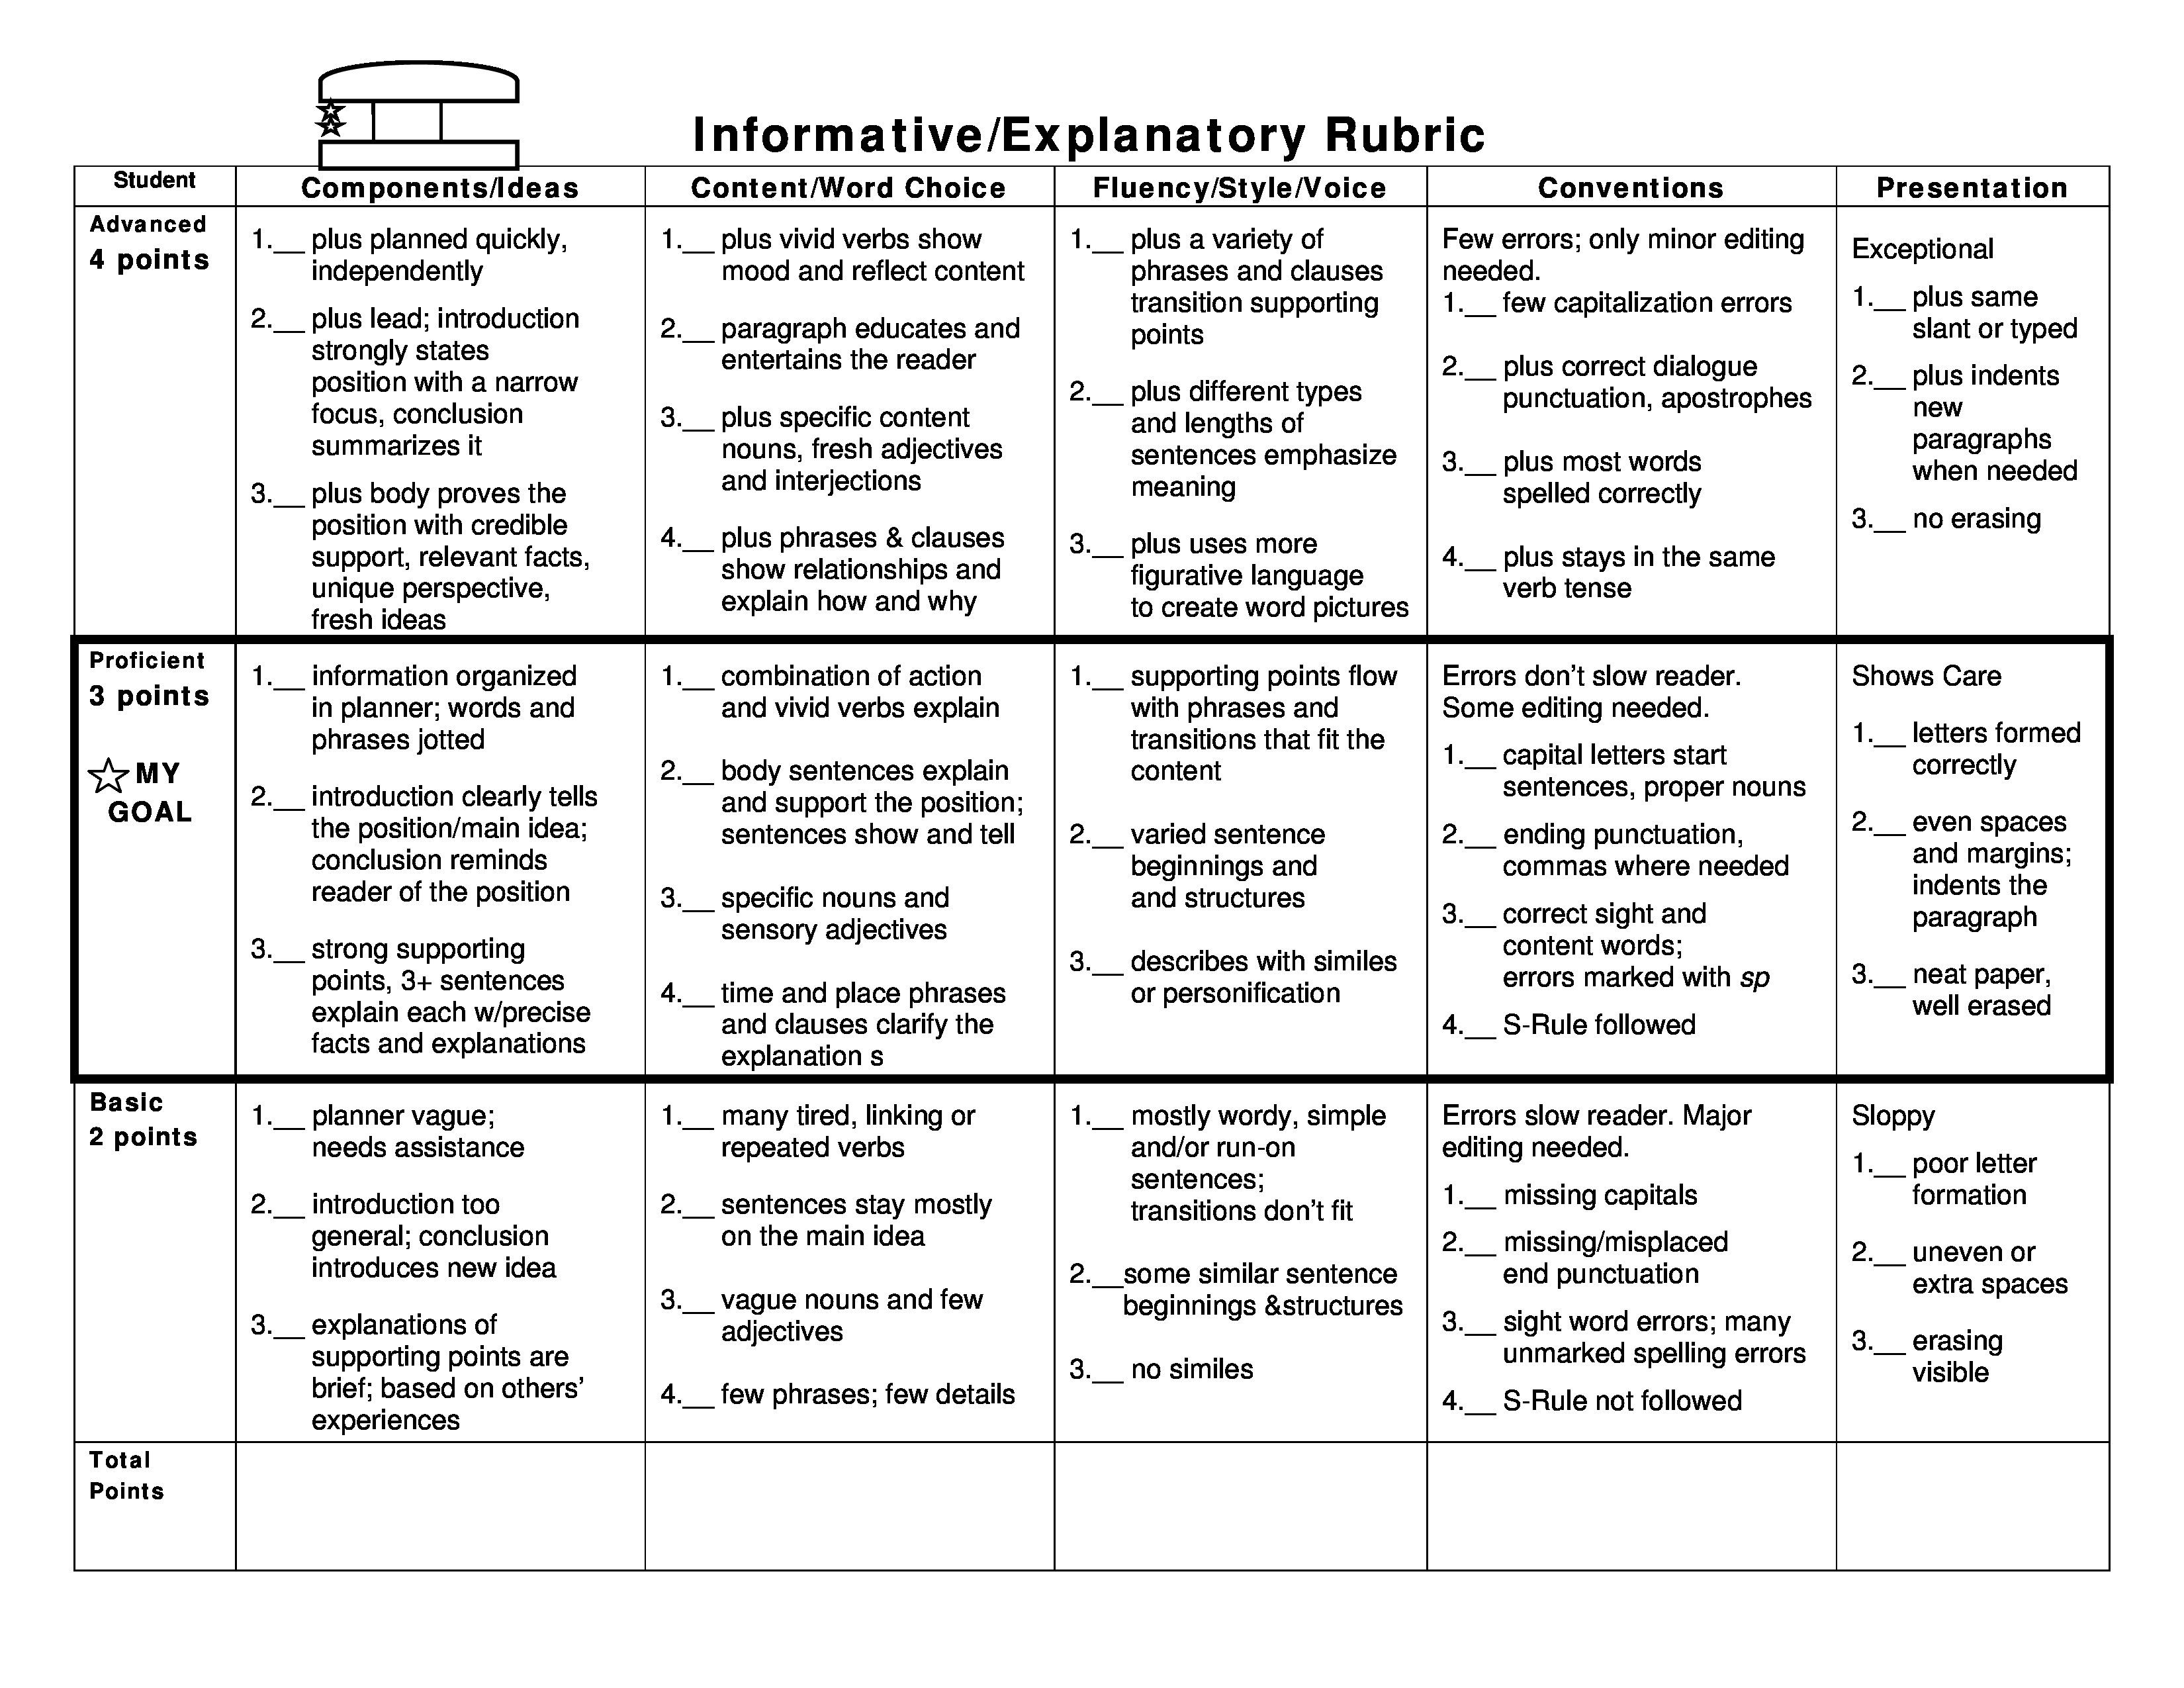 002 Essay Example Free Online Grader Gr4 Sensational Scoring Paper For Students Sat Full